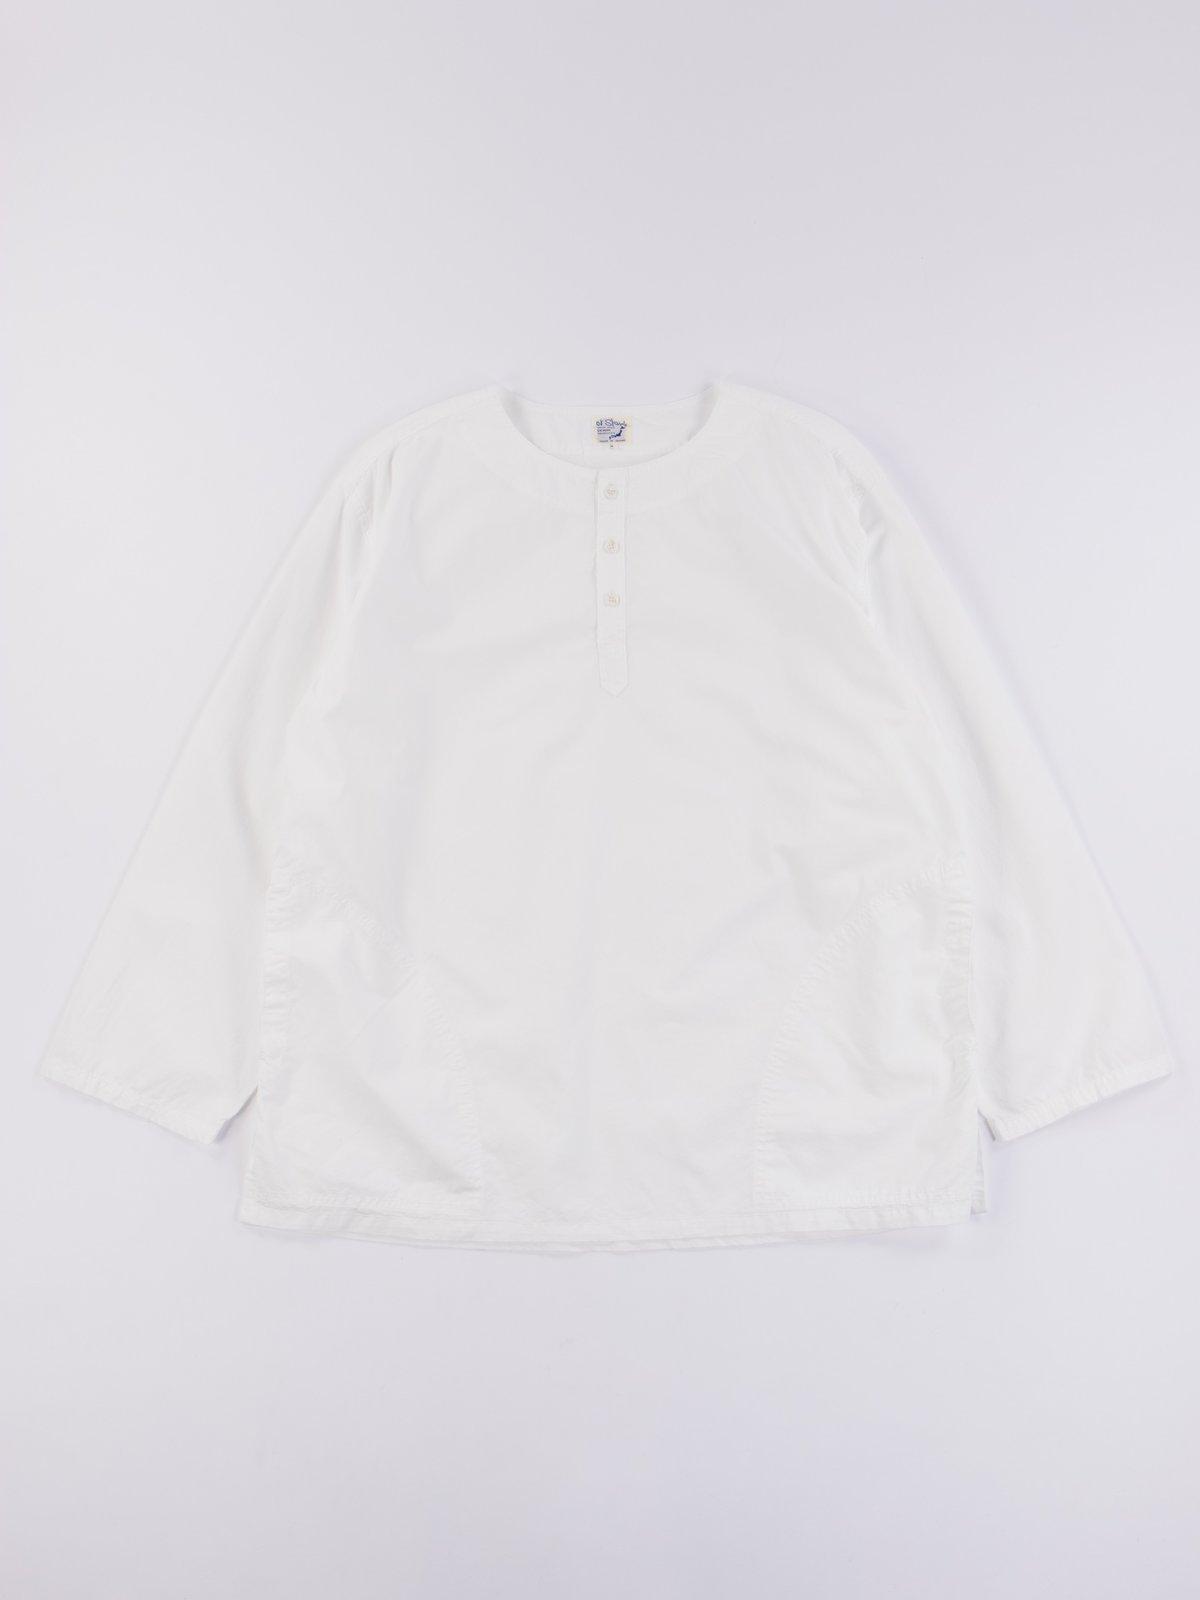 White Poplin Pullover Shirt - Image 1